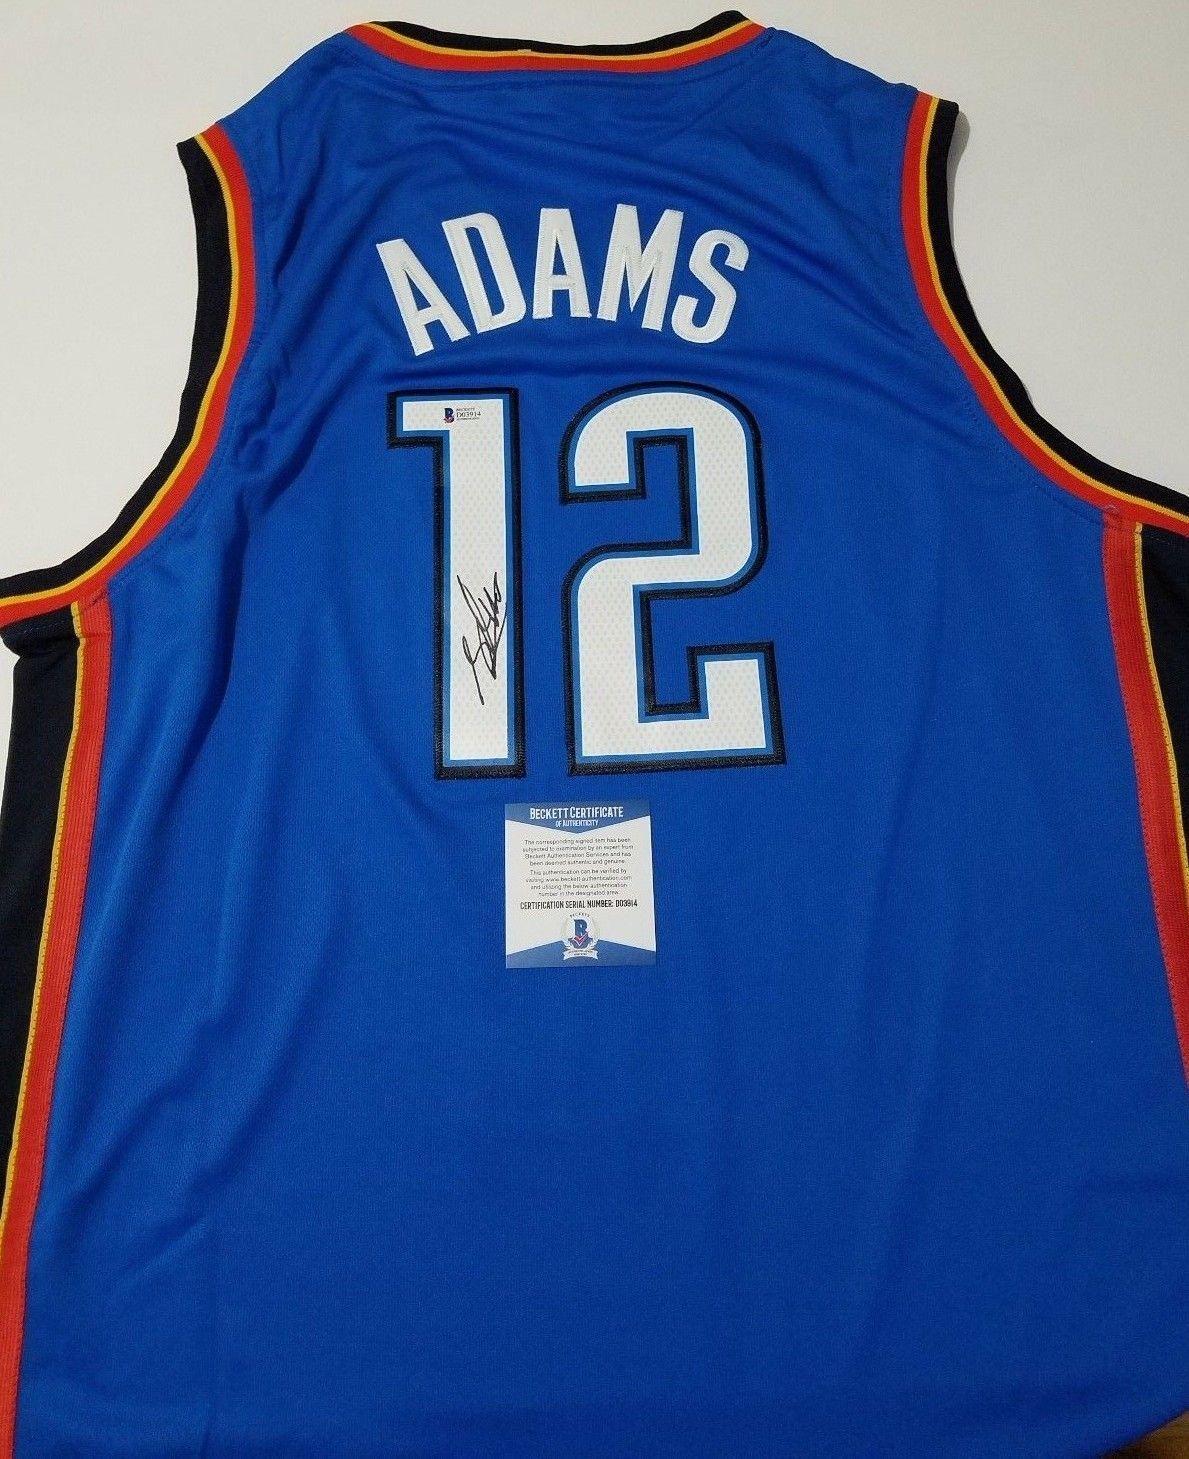 steven adams jersey